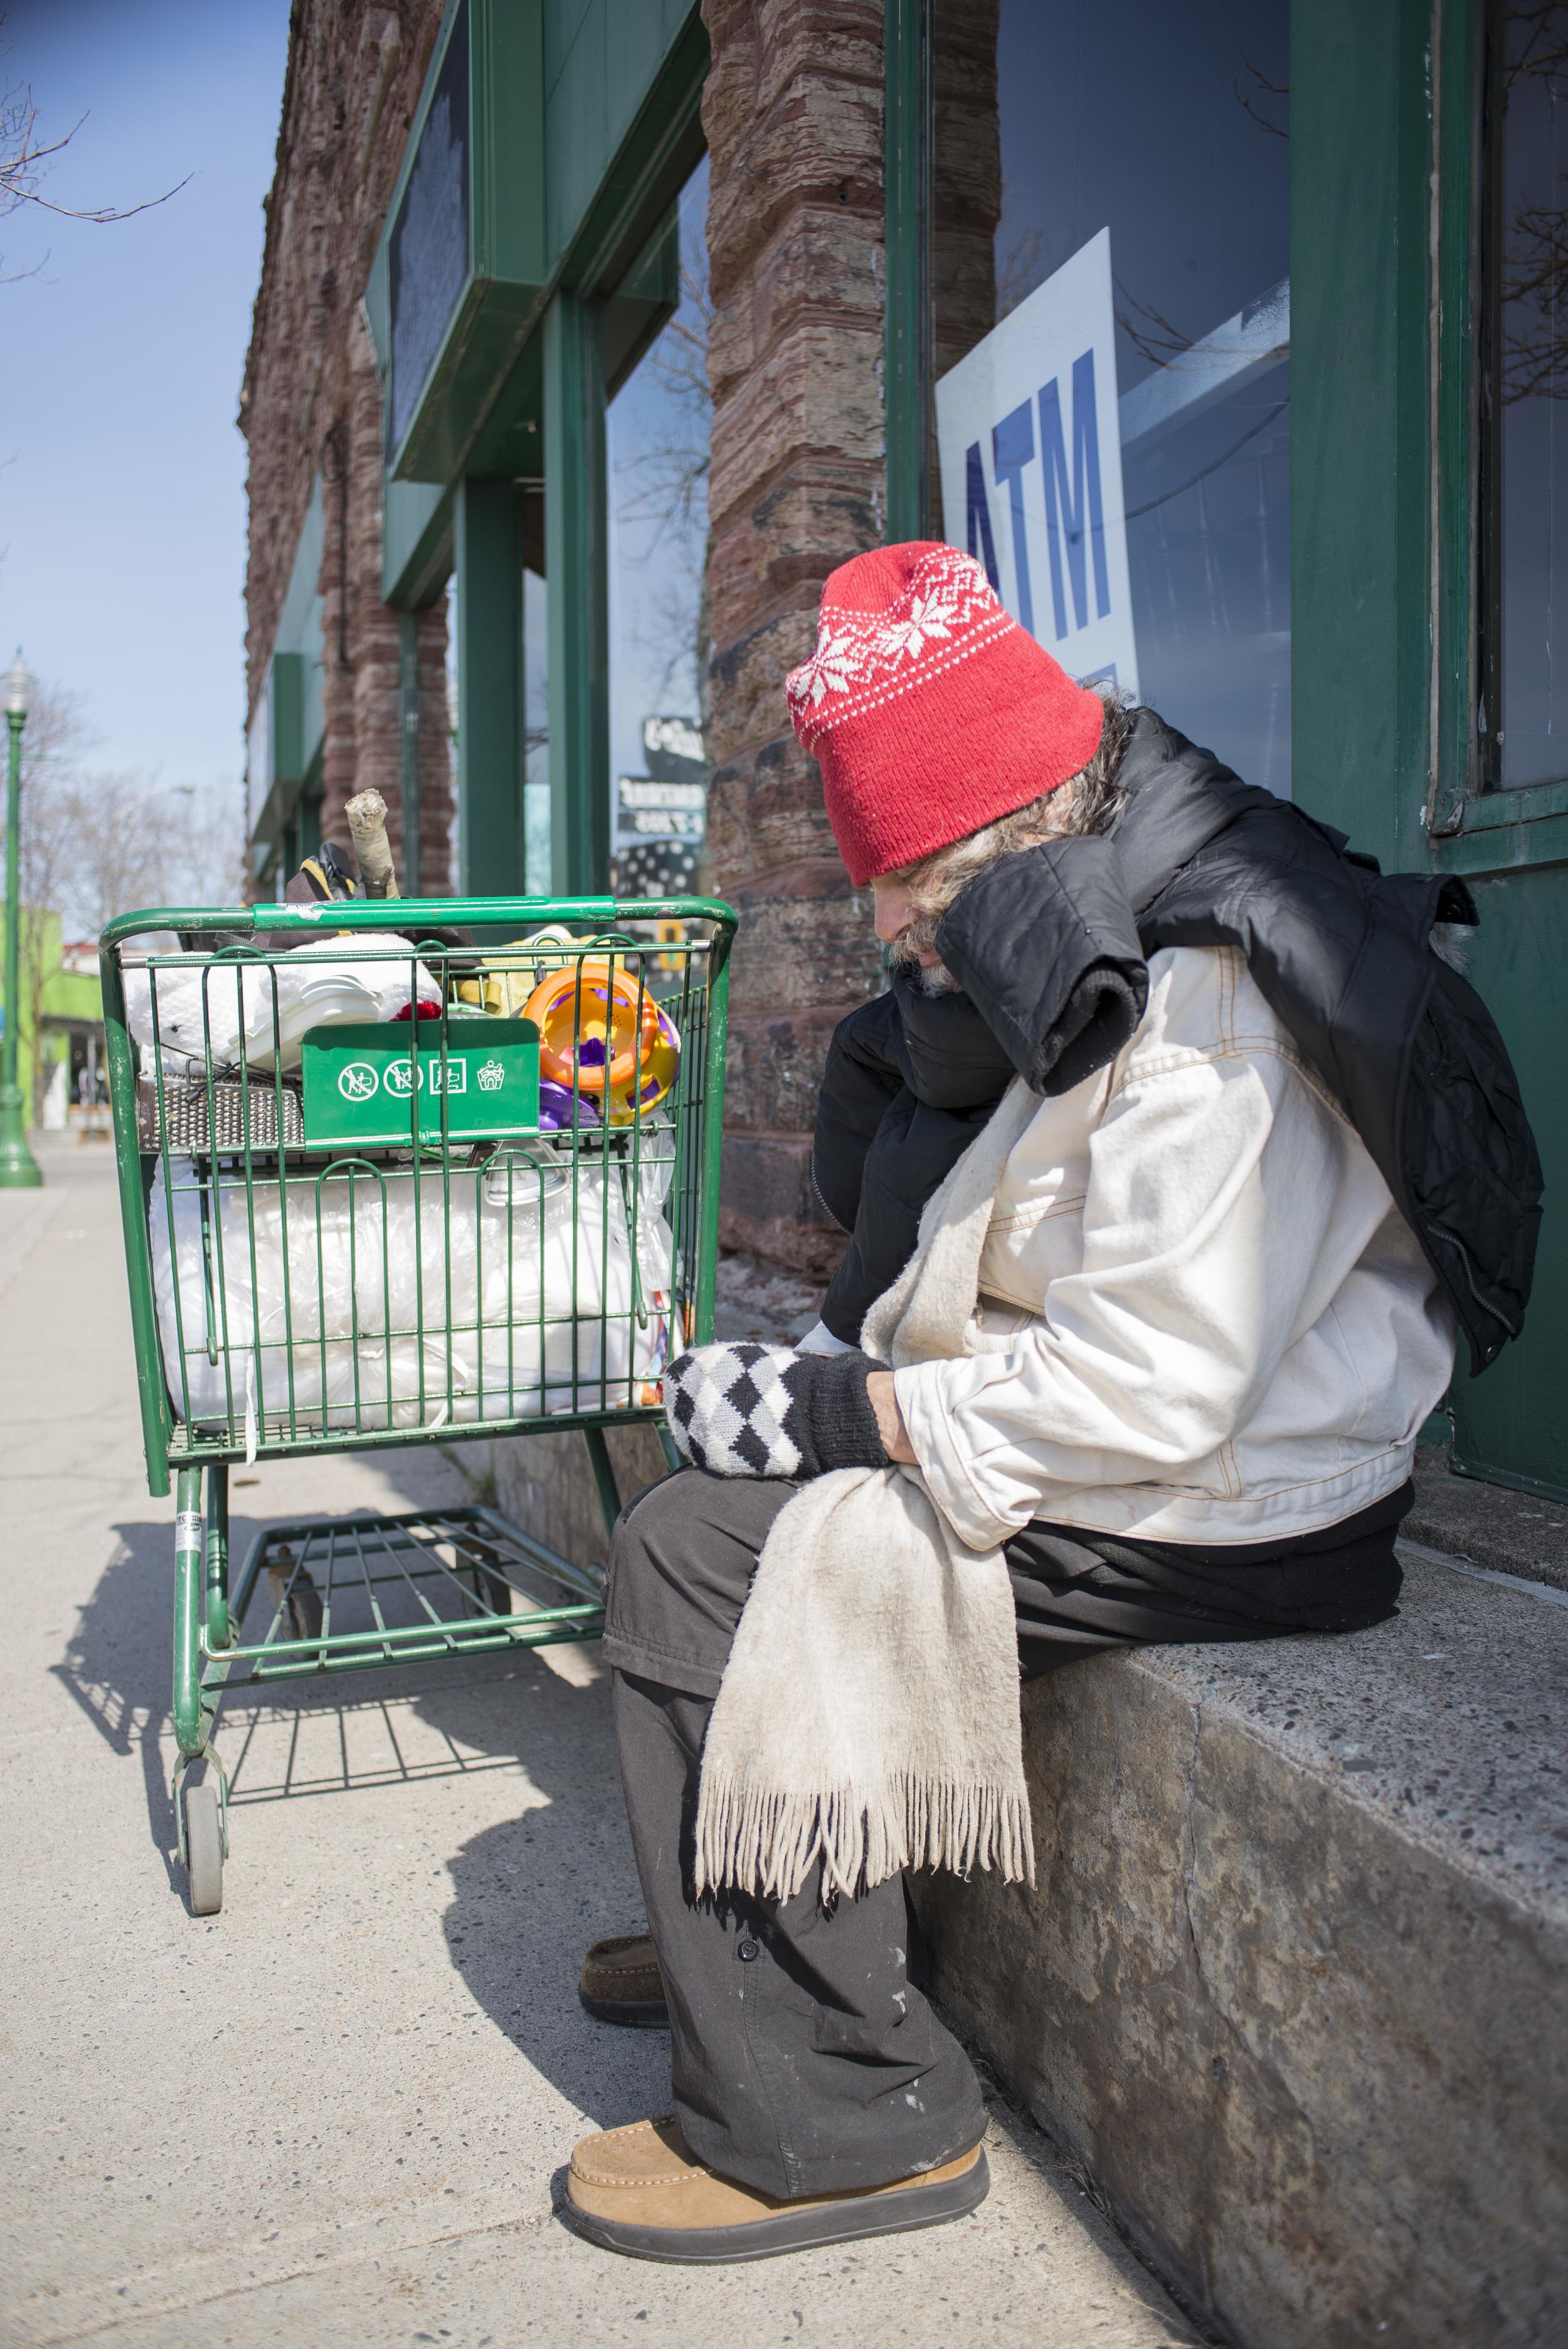 Homelessness STW28May14 ap 3272.jpg